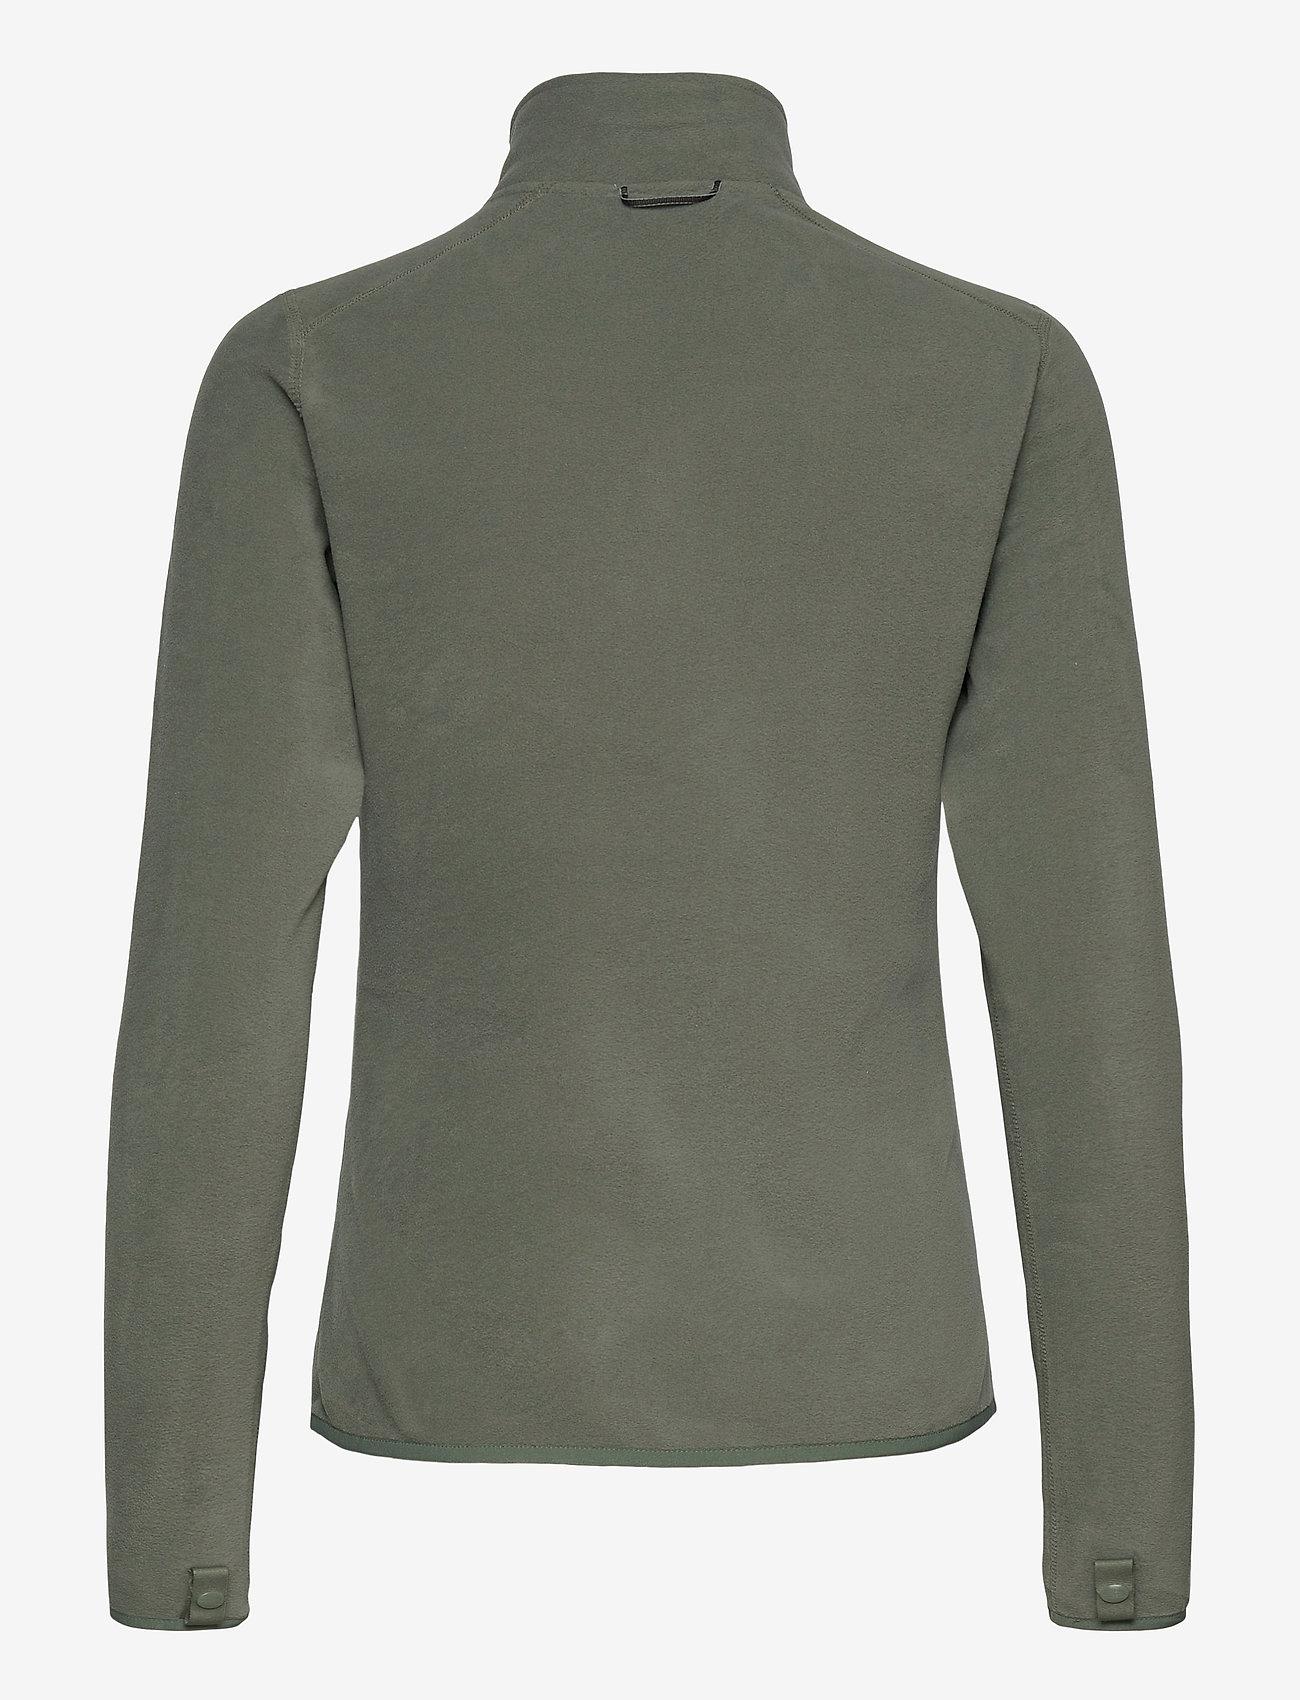 The North Face - W 100 GLACIER FULL ZIP - EU - fleece - agave green - 1